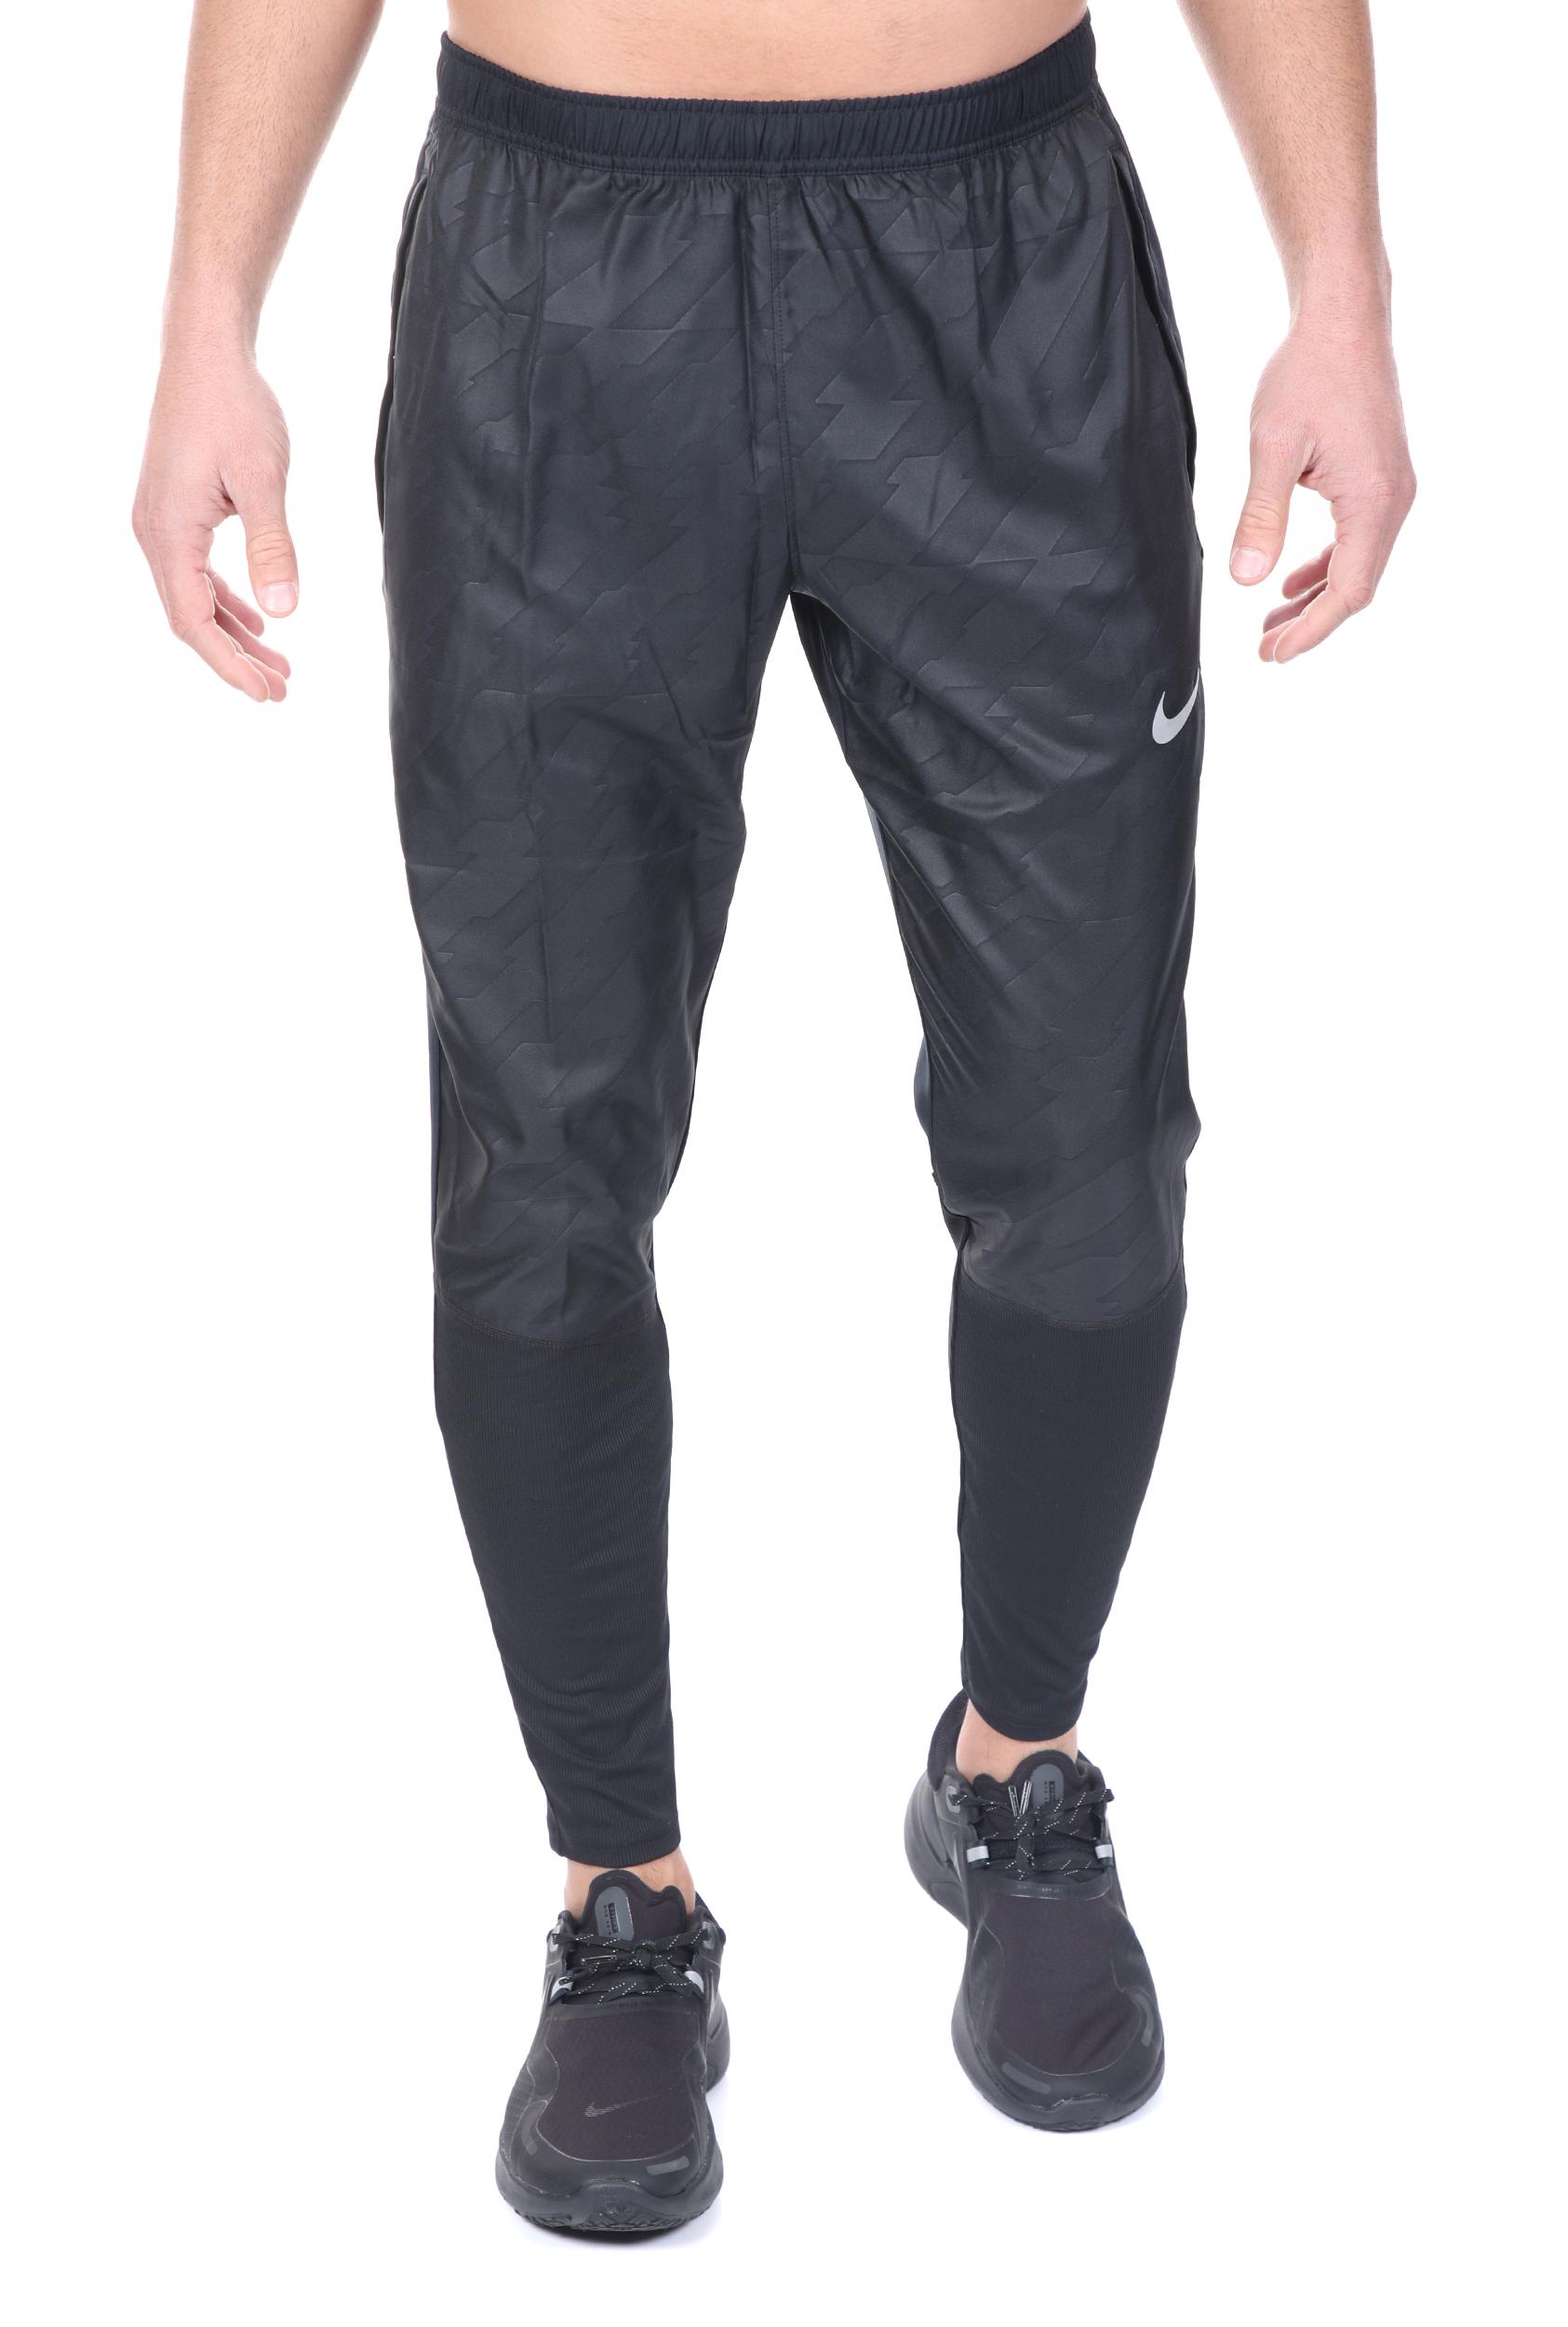 NIKE - Ανδρικό παντελόνι φόρμας NIKE ESSN HYB FF PR μαύρο